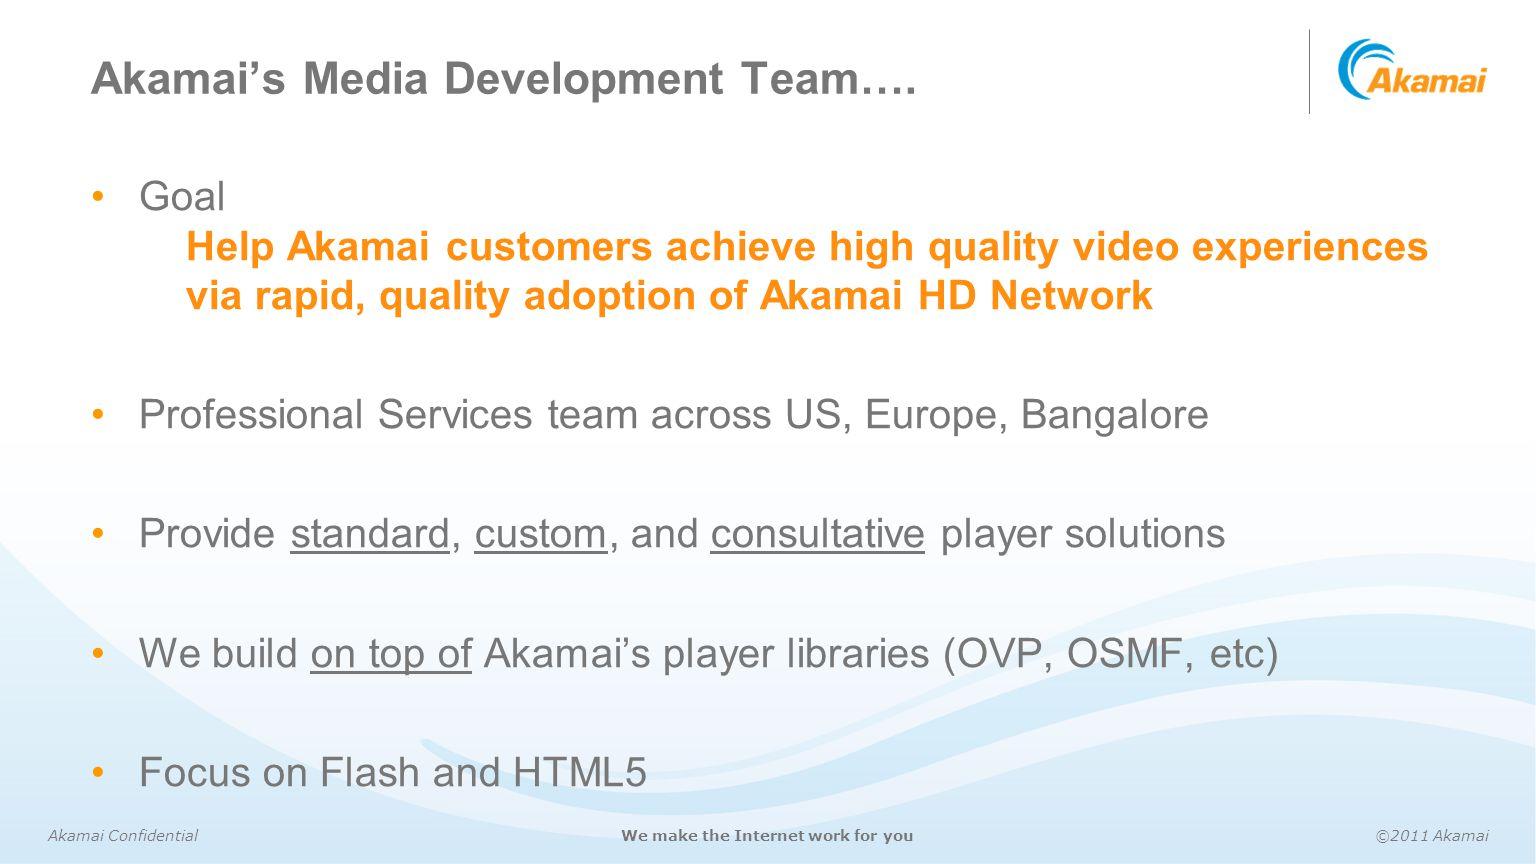 Akamai Confidential©2011 AkamaiWe make the Internet work for you Akamai's Media Development Team…. Goal Help Akamai customers achieve high quality vid